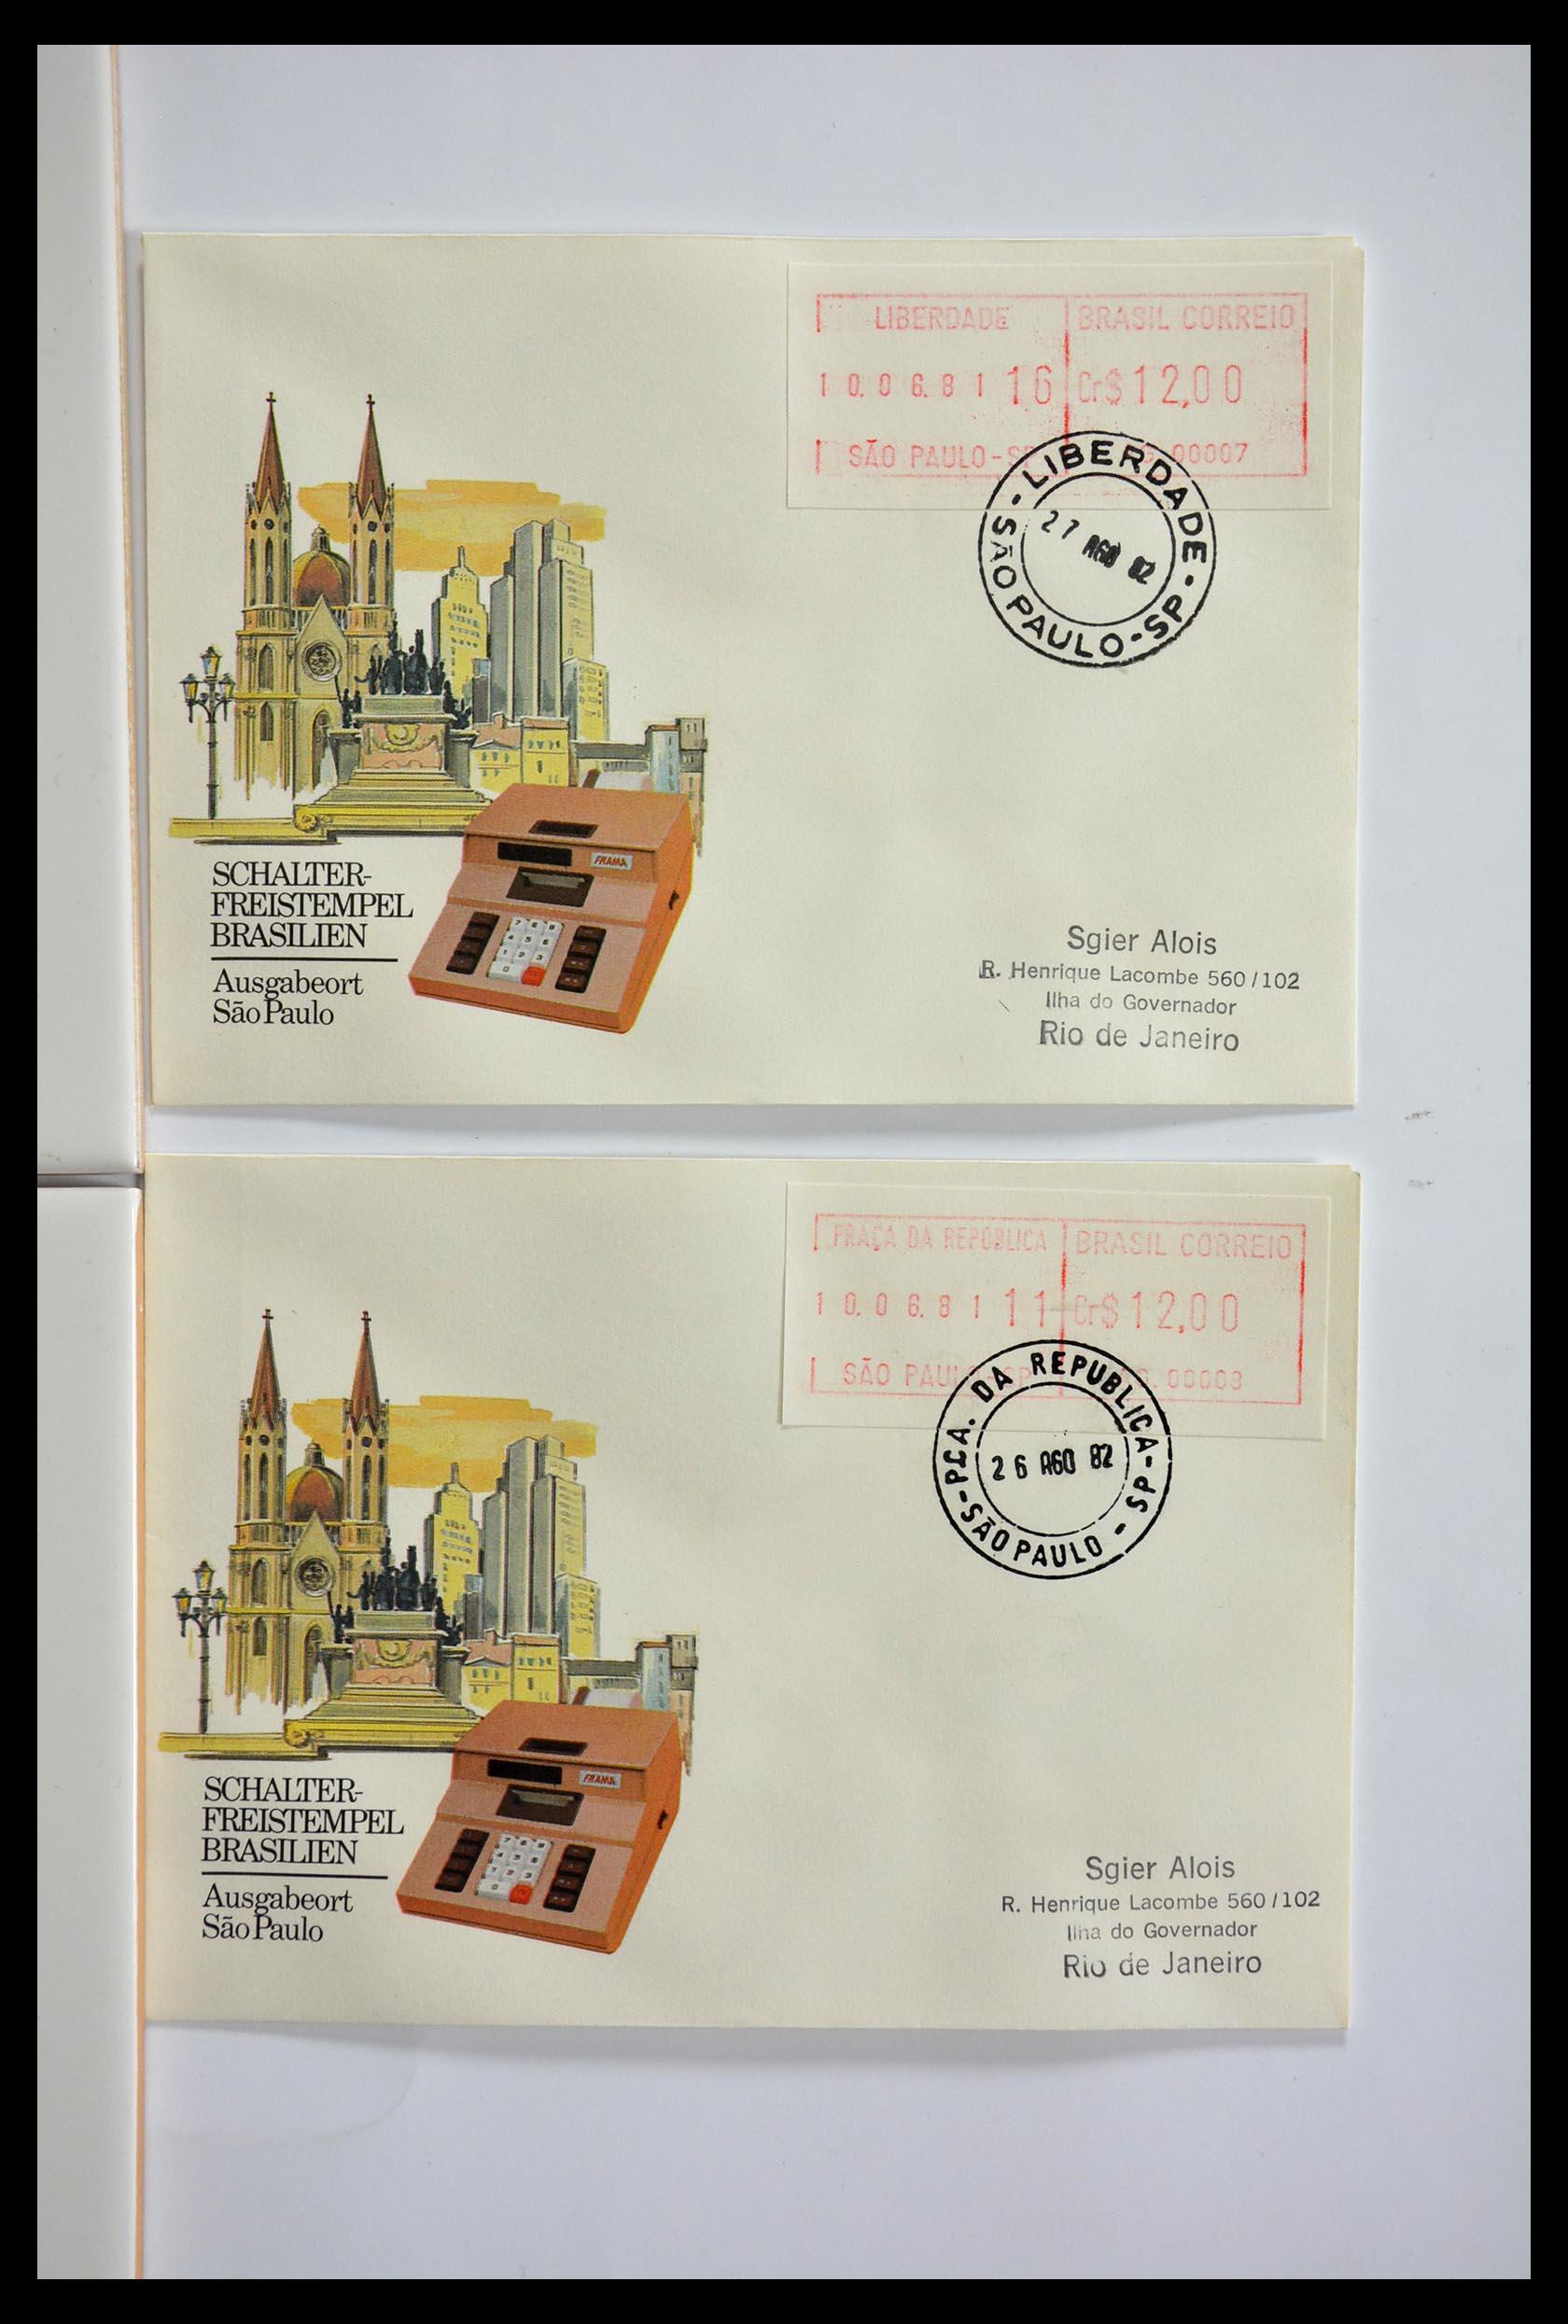 29353 019 - 29353 West Europa automaatzegels.